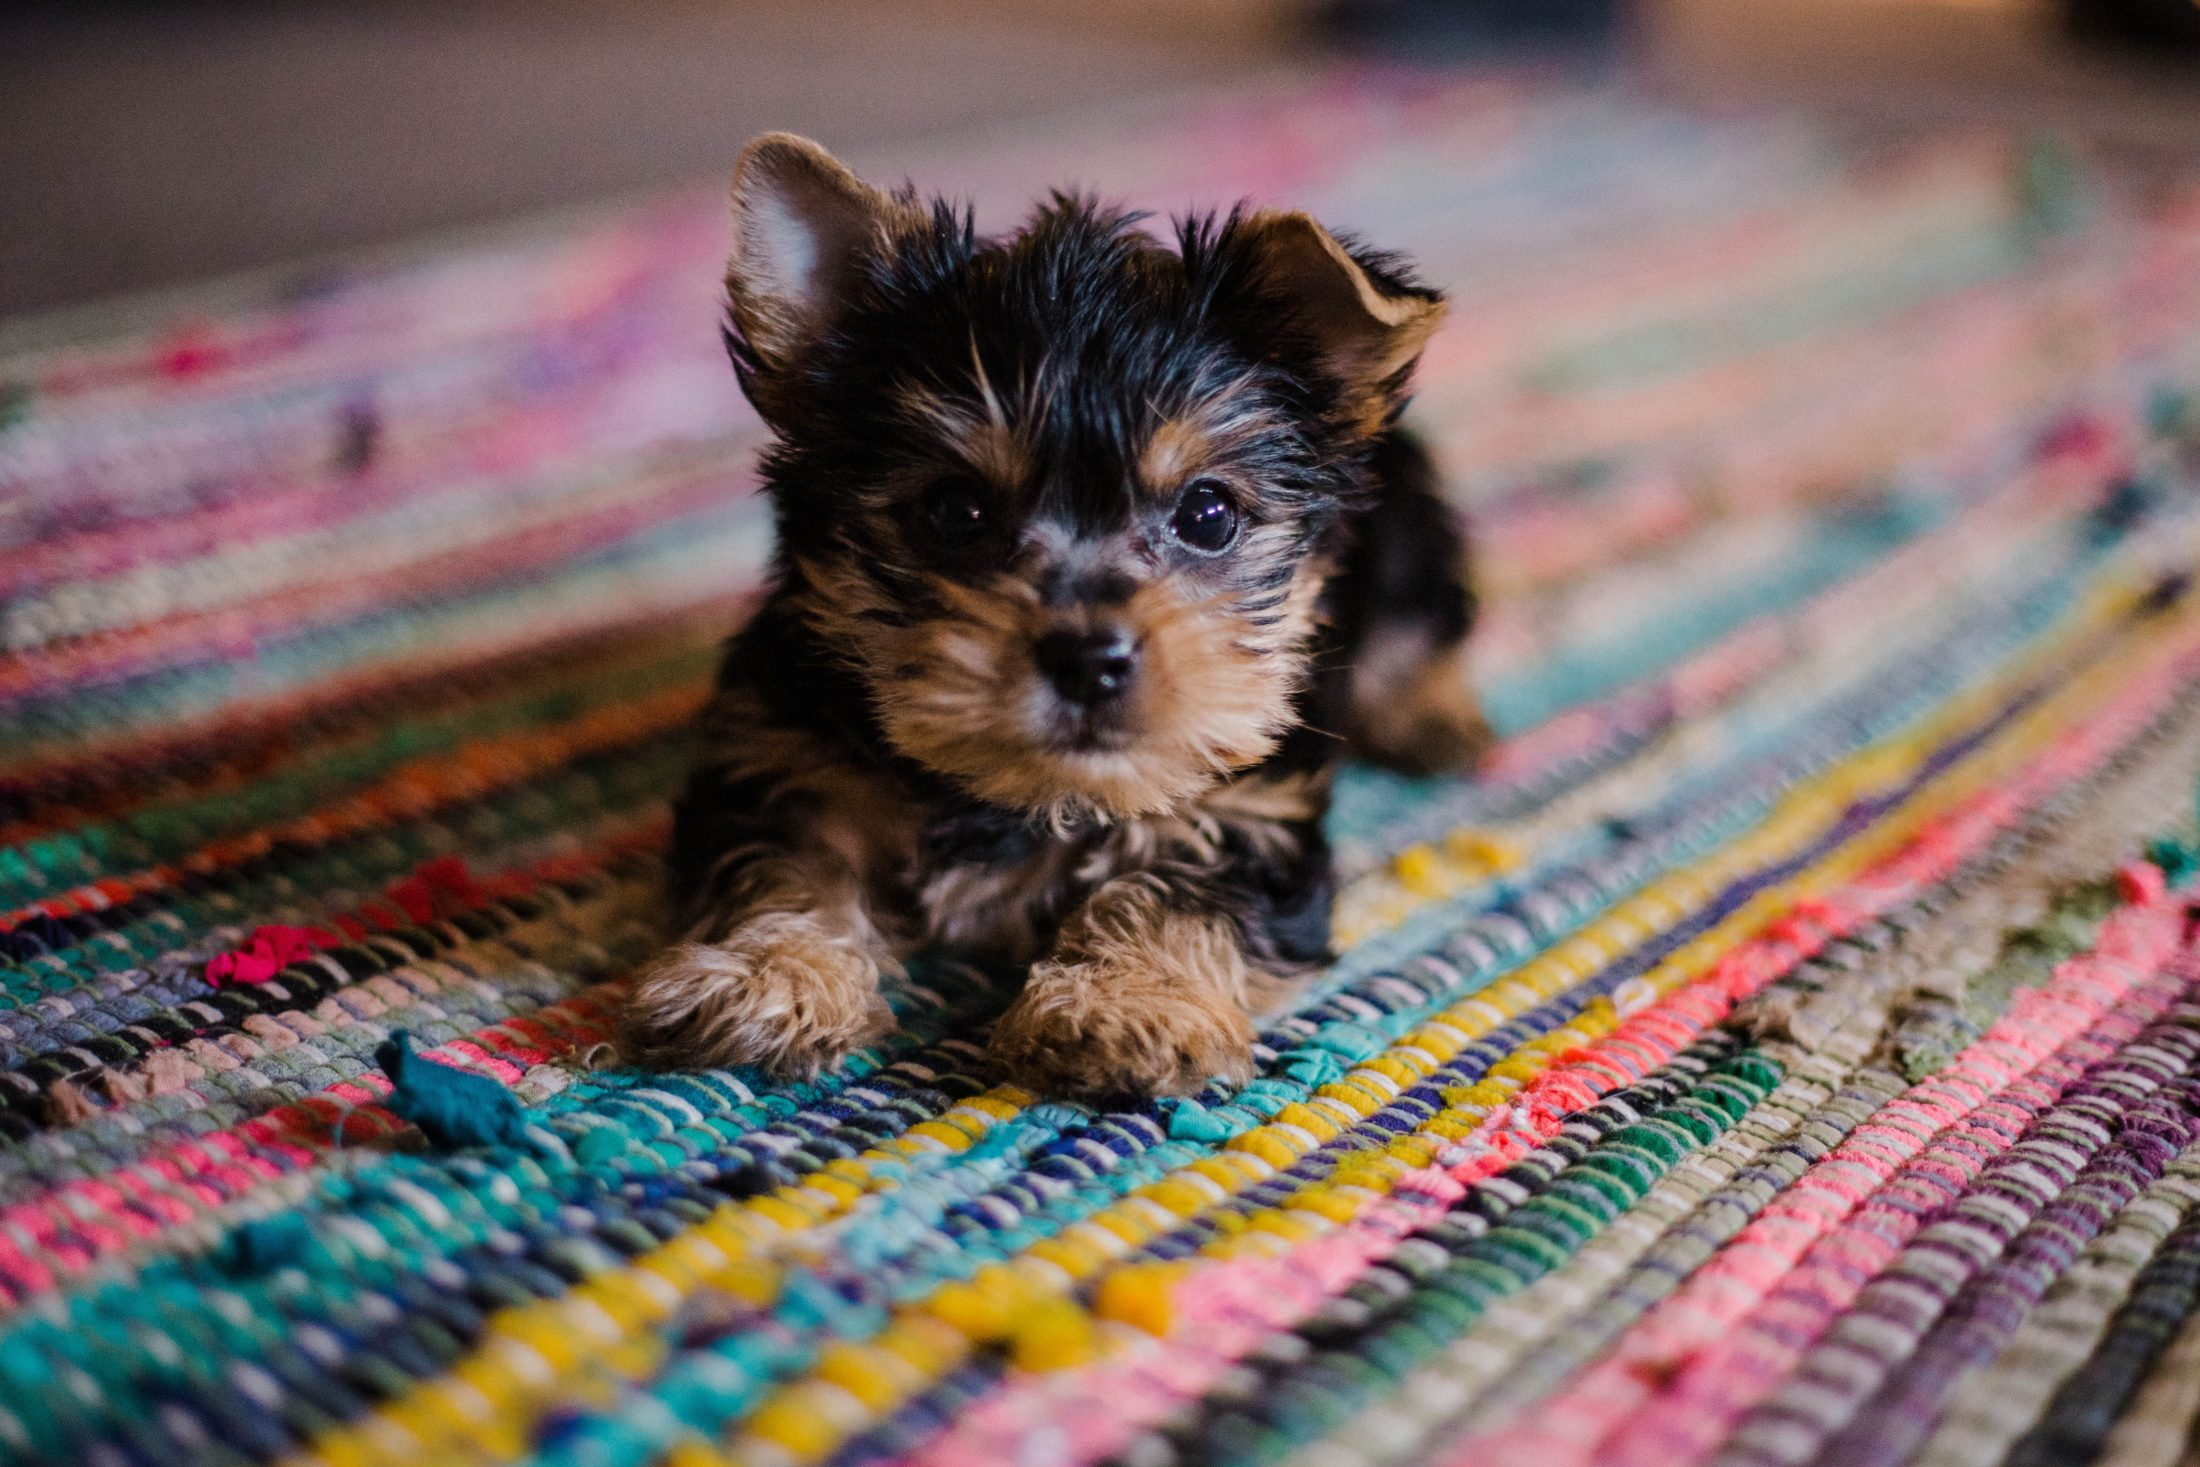 novo filhote no tapete